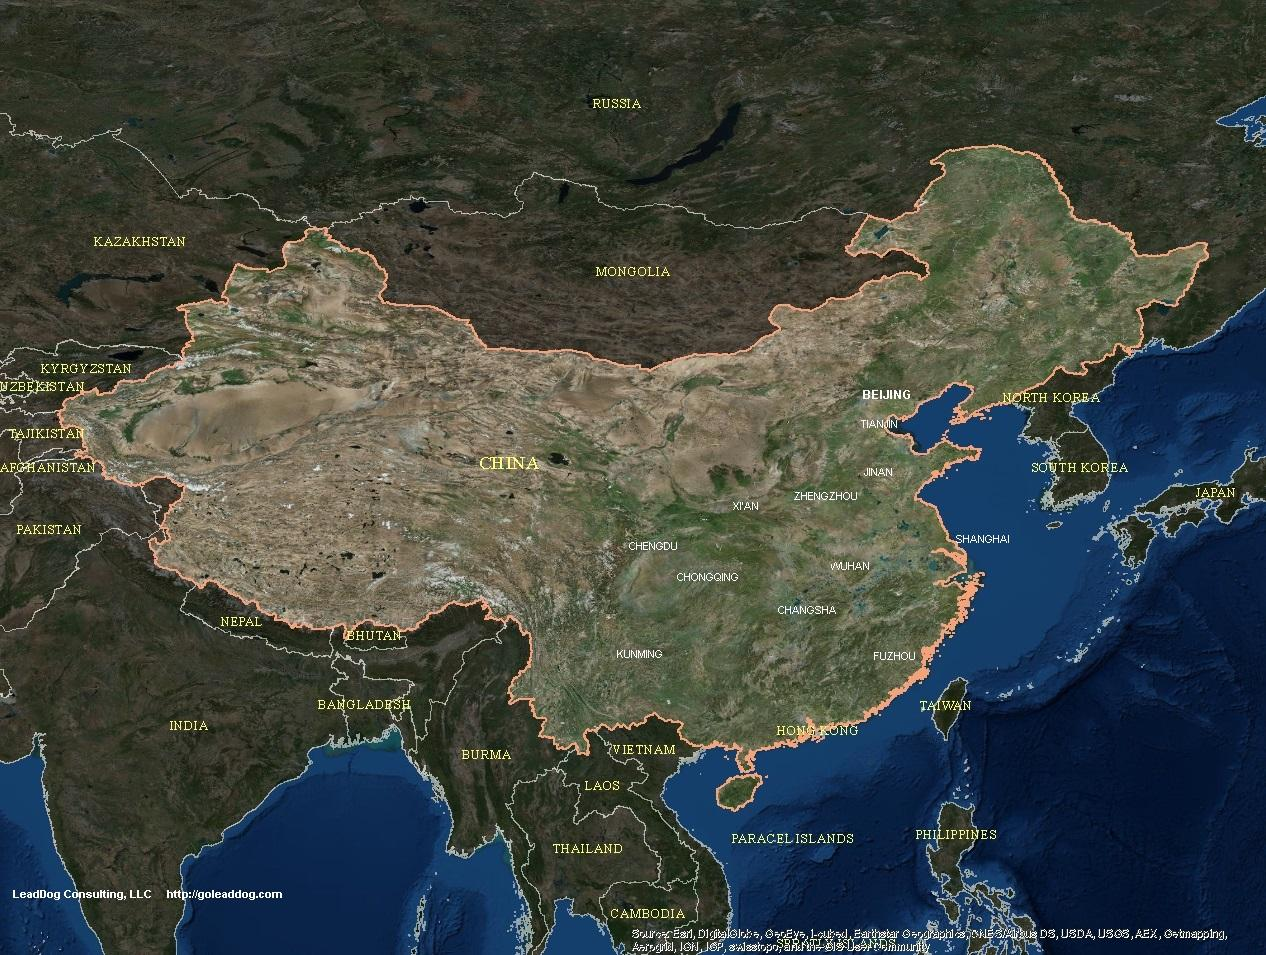 China Harta Prin Satelit China Harta Satelit Asia De Est Asia